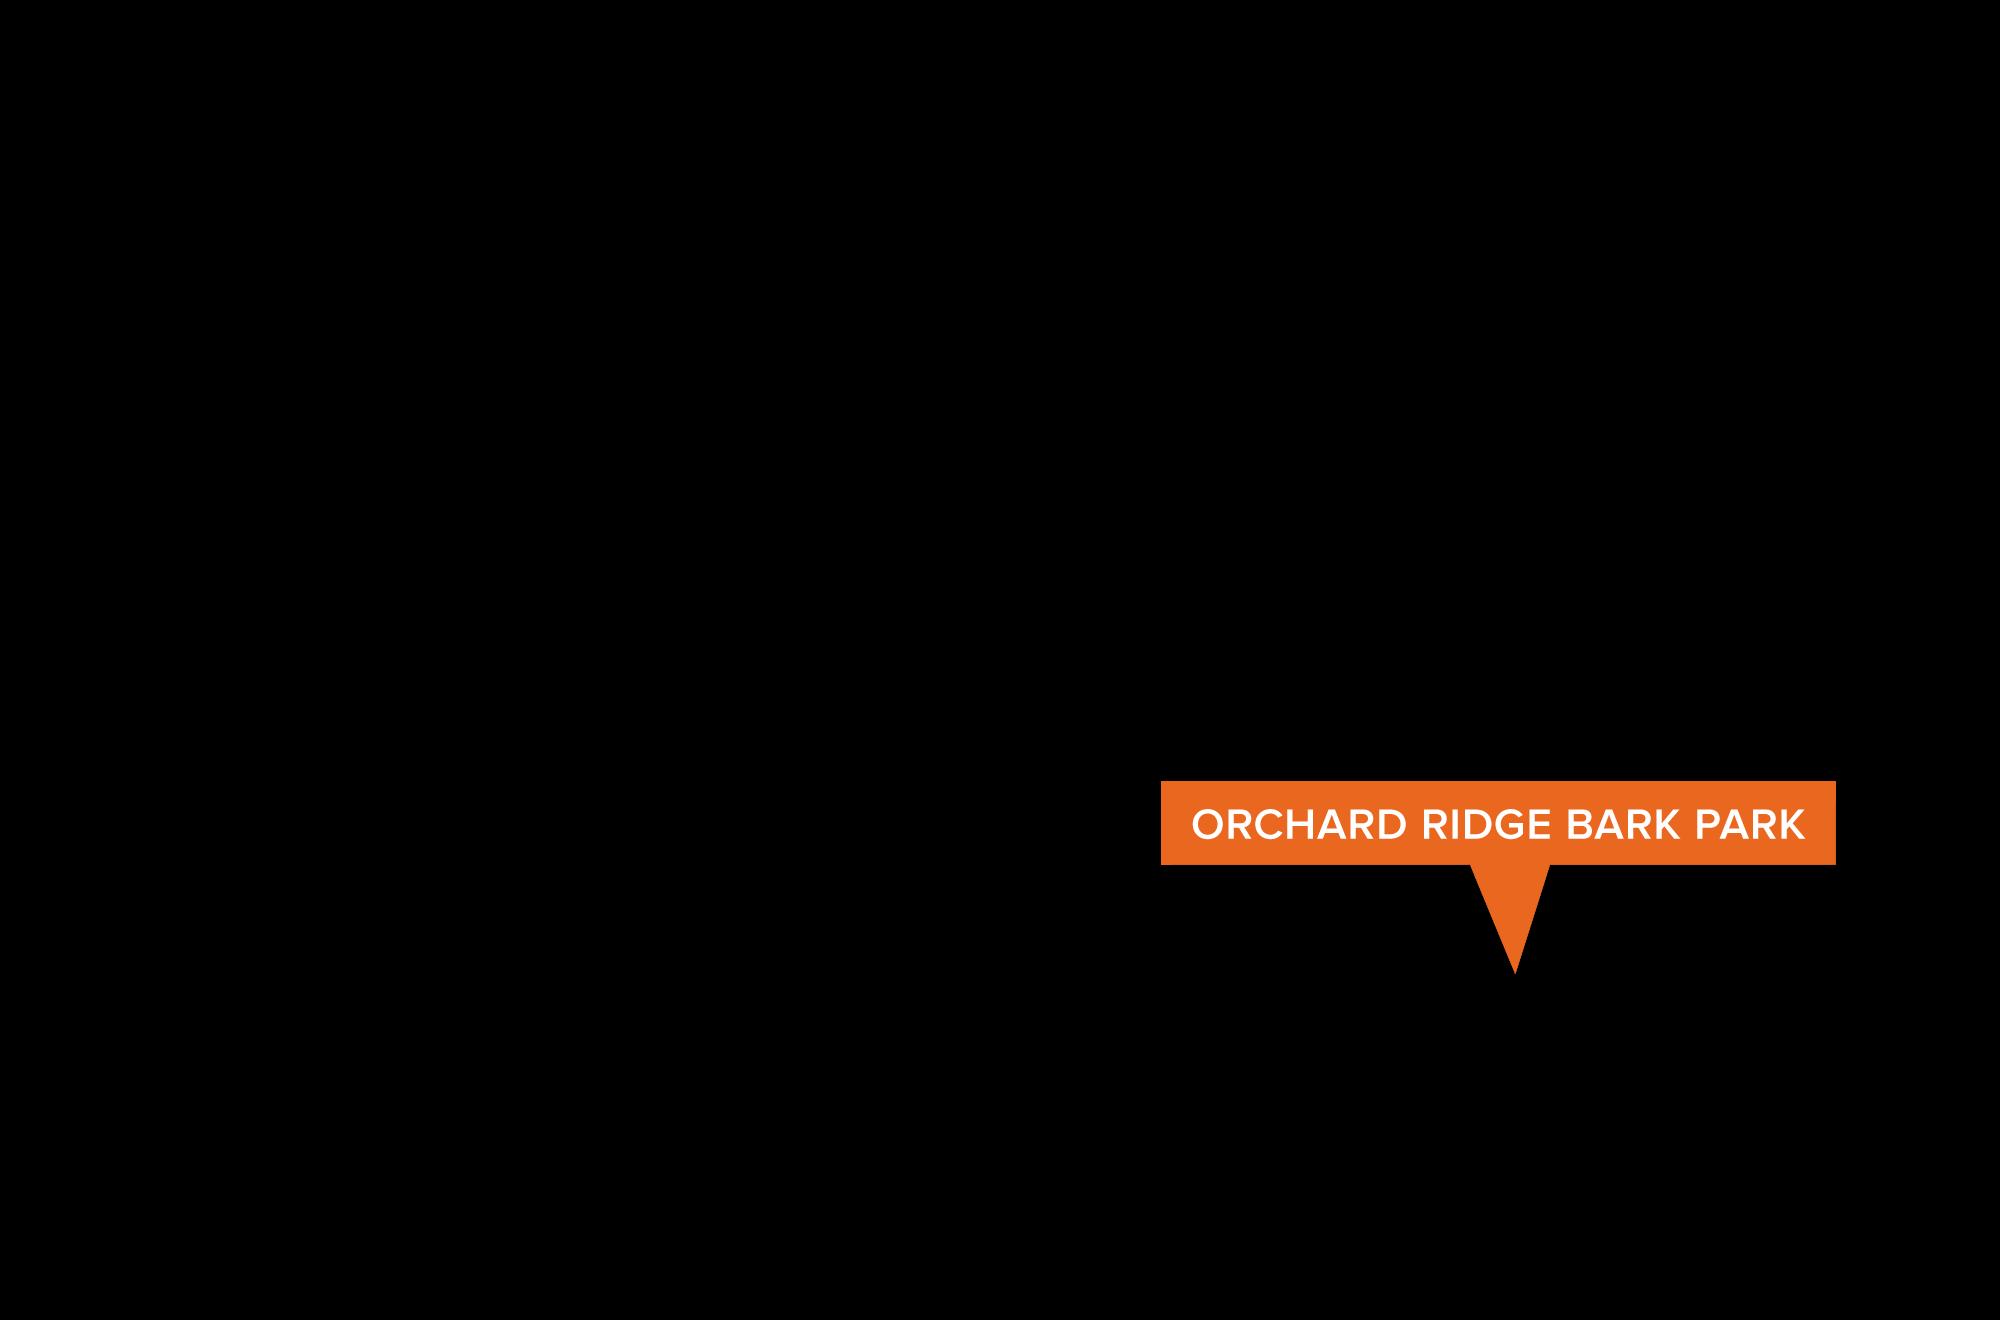 Orchard Ridge Bark Park